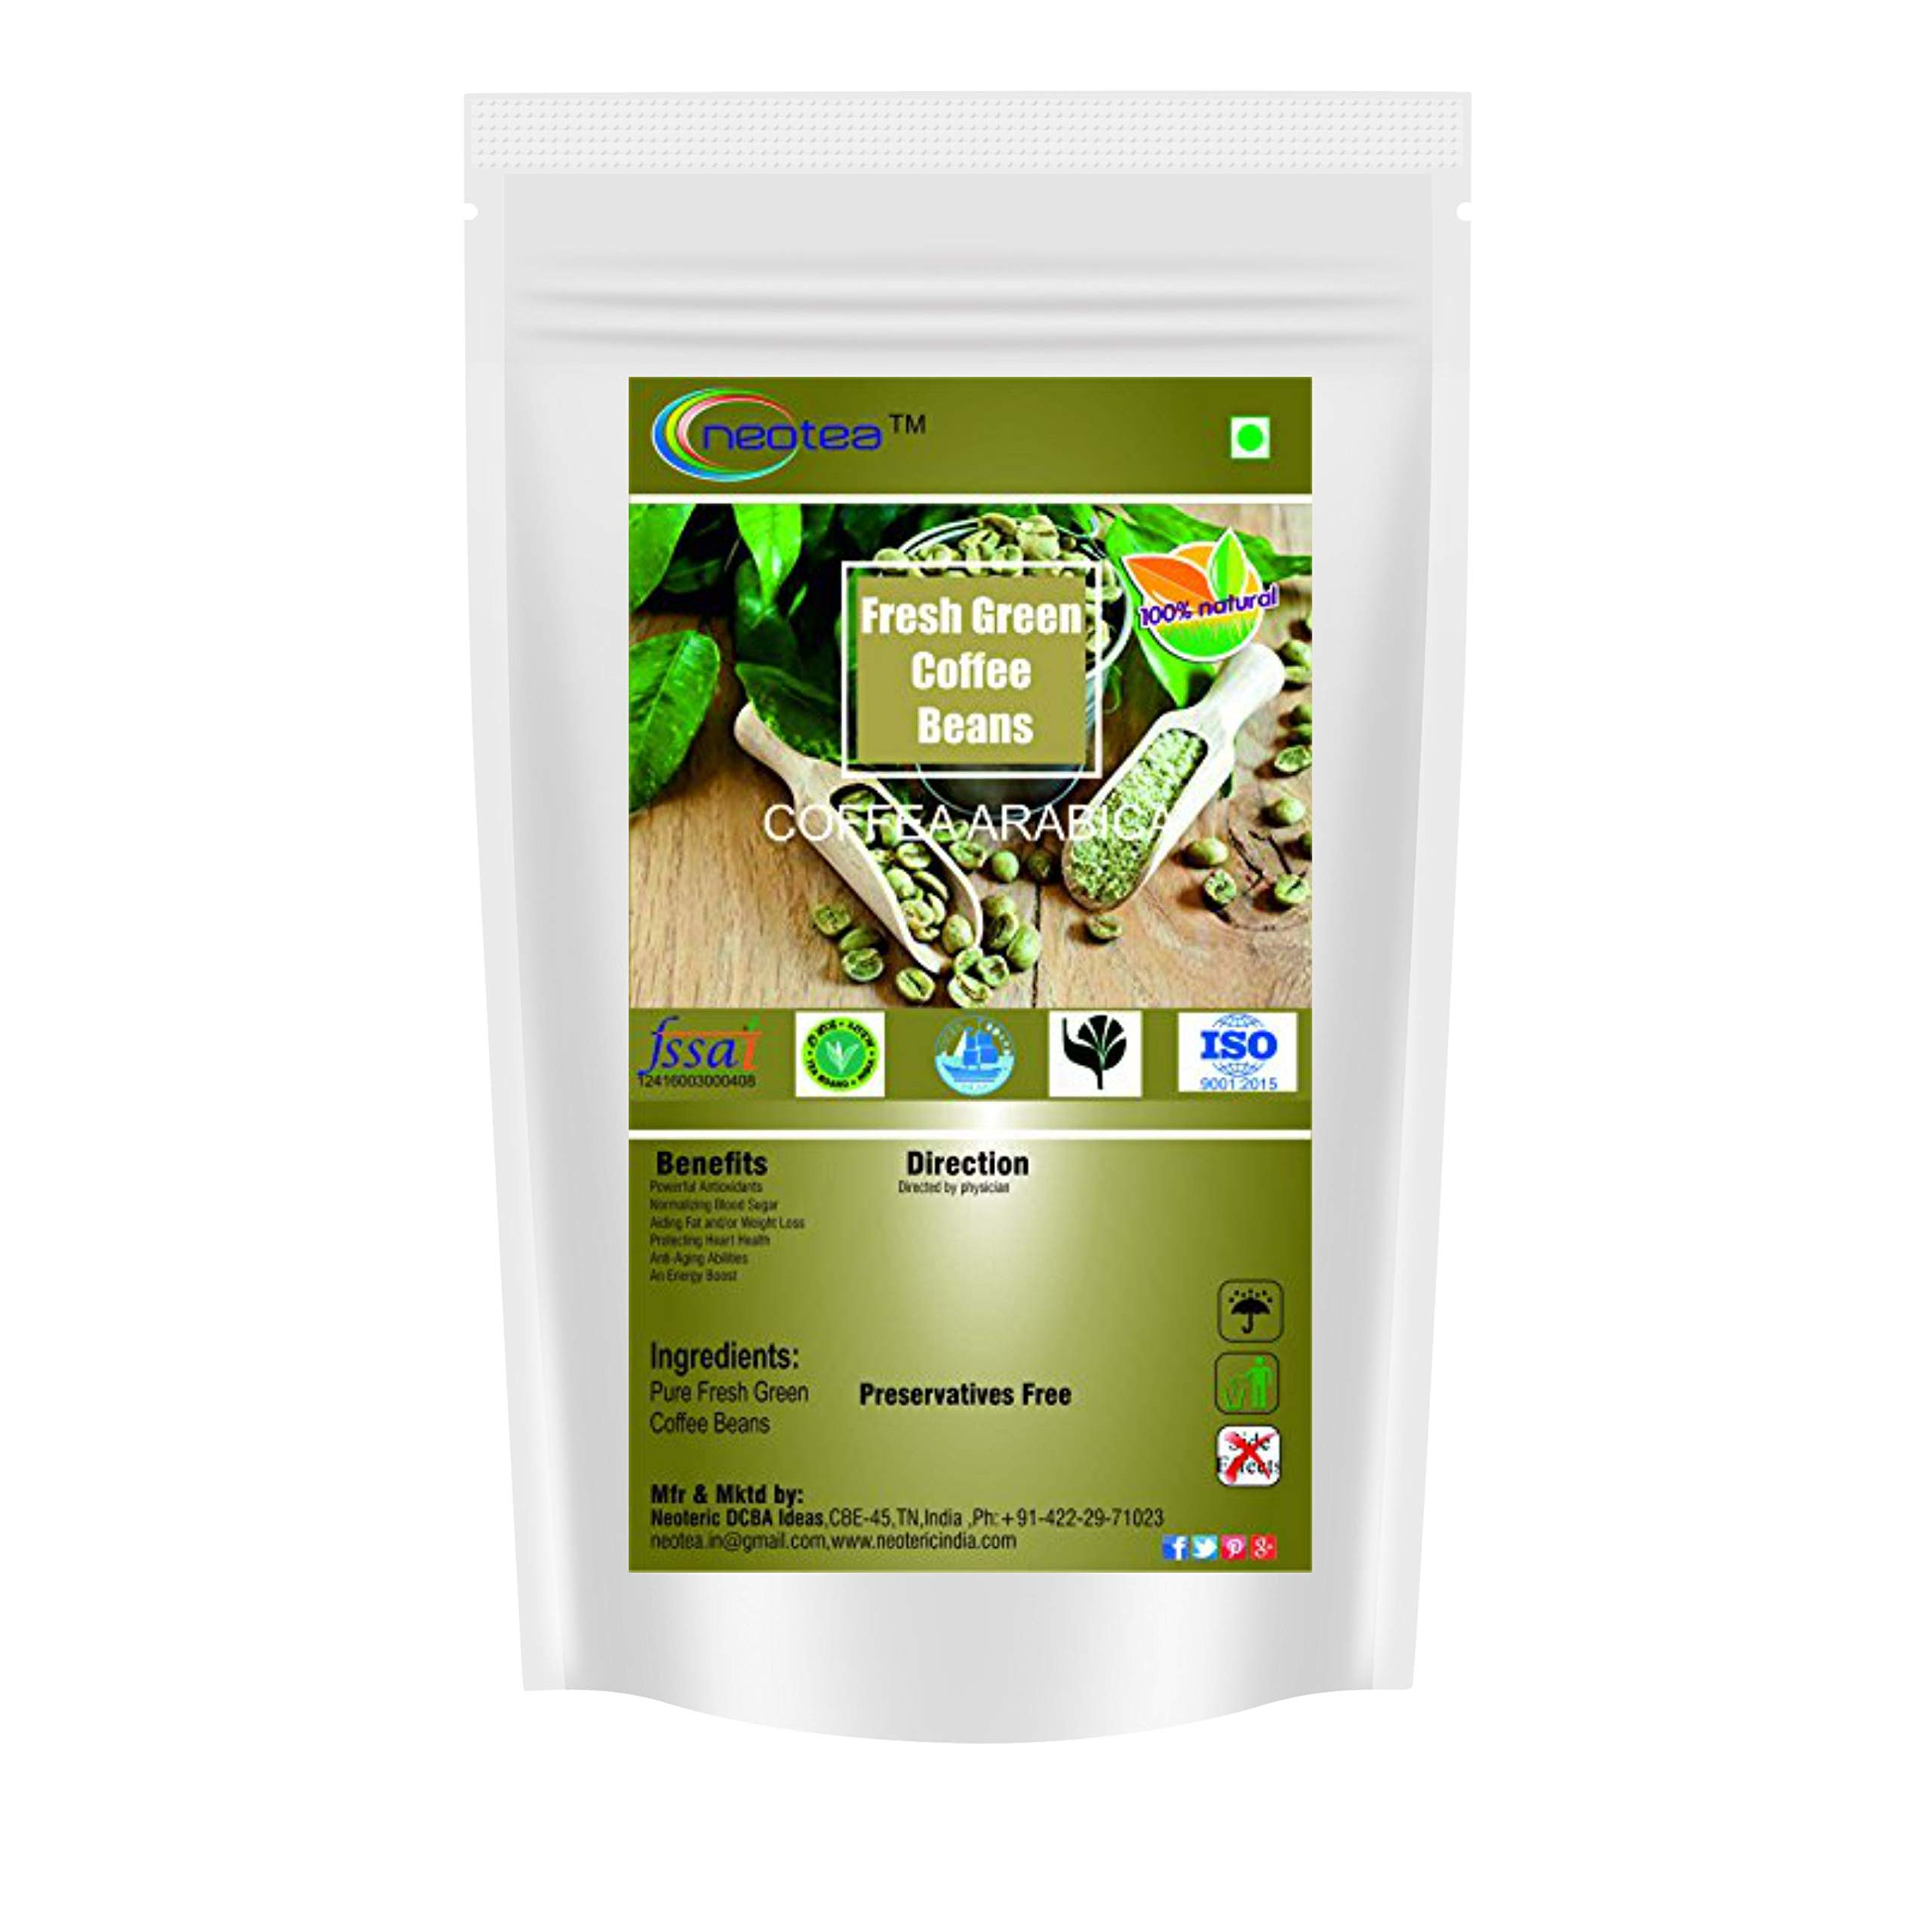 Neotea Fresh Green Coffee Beans (1kg)